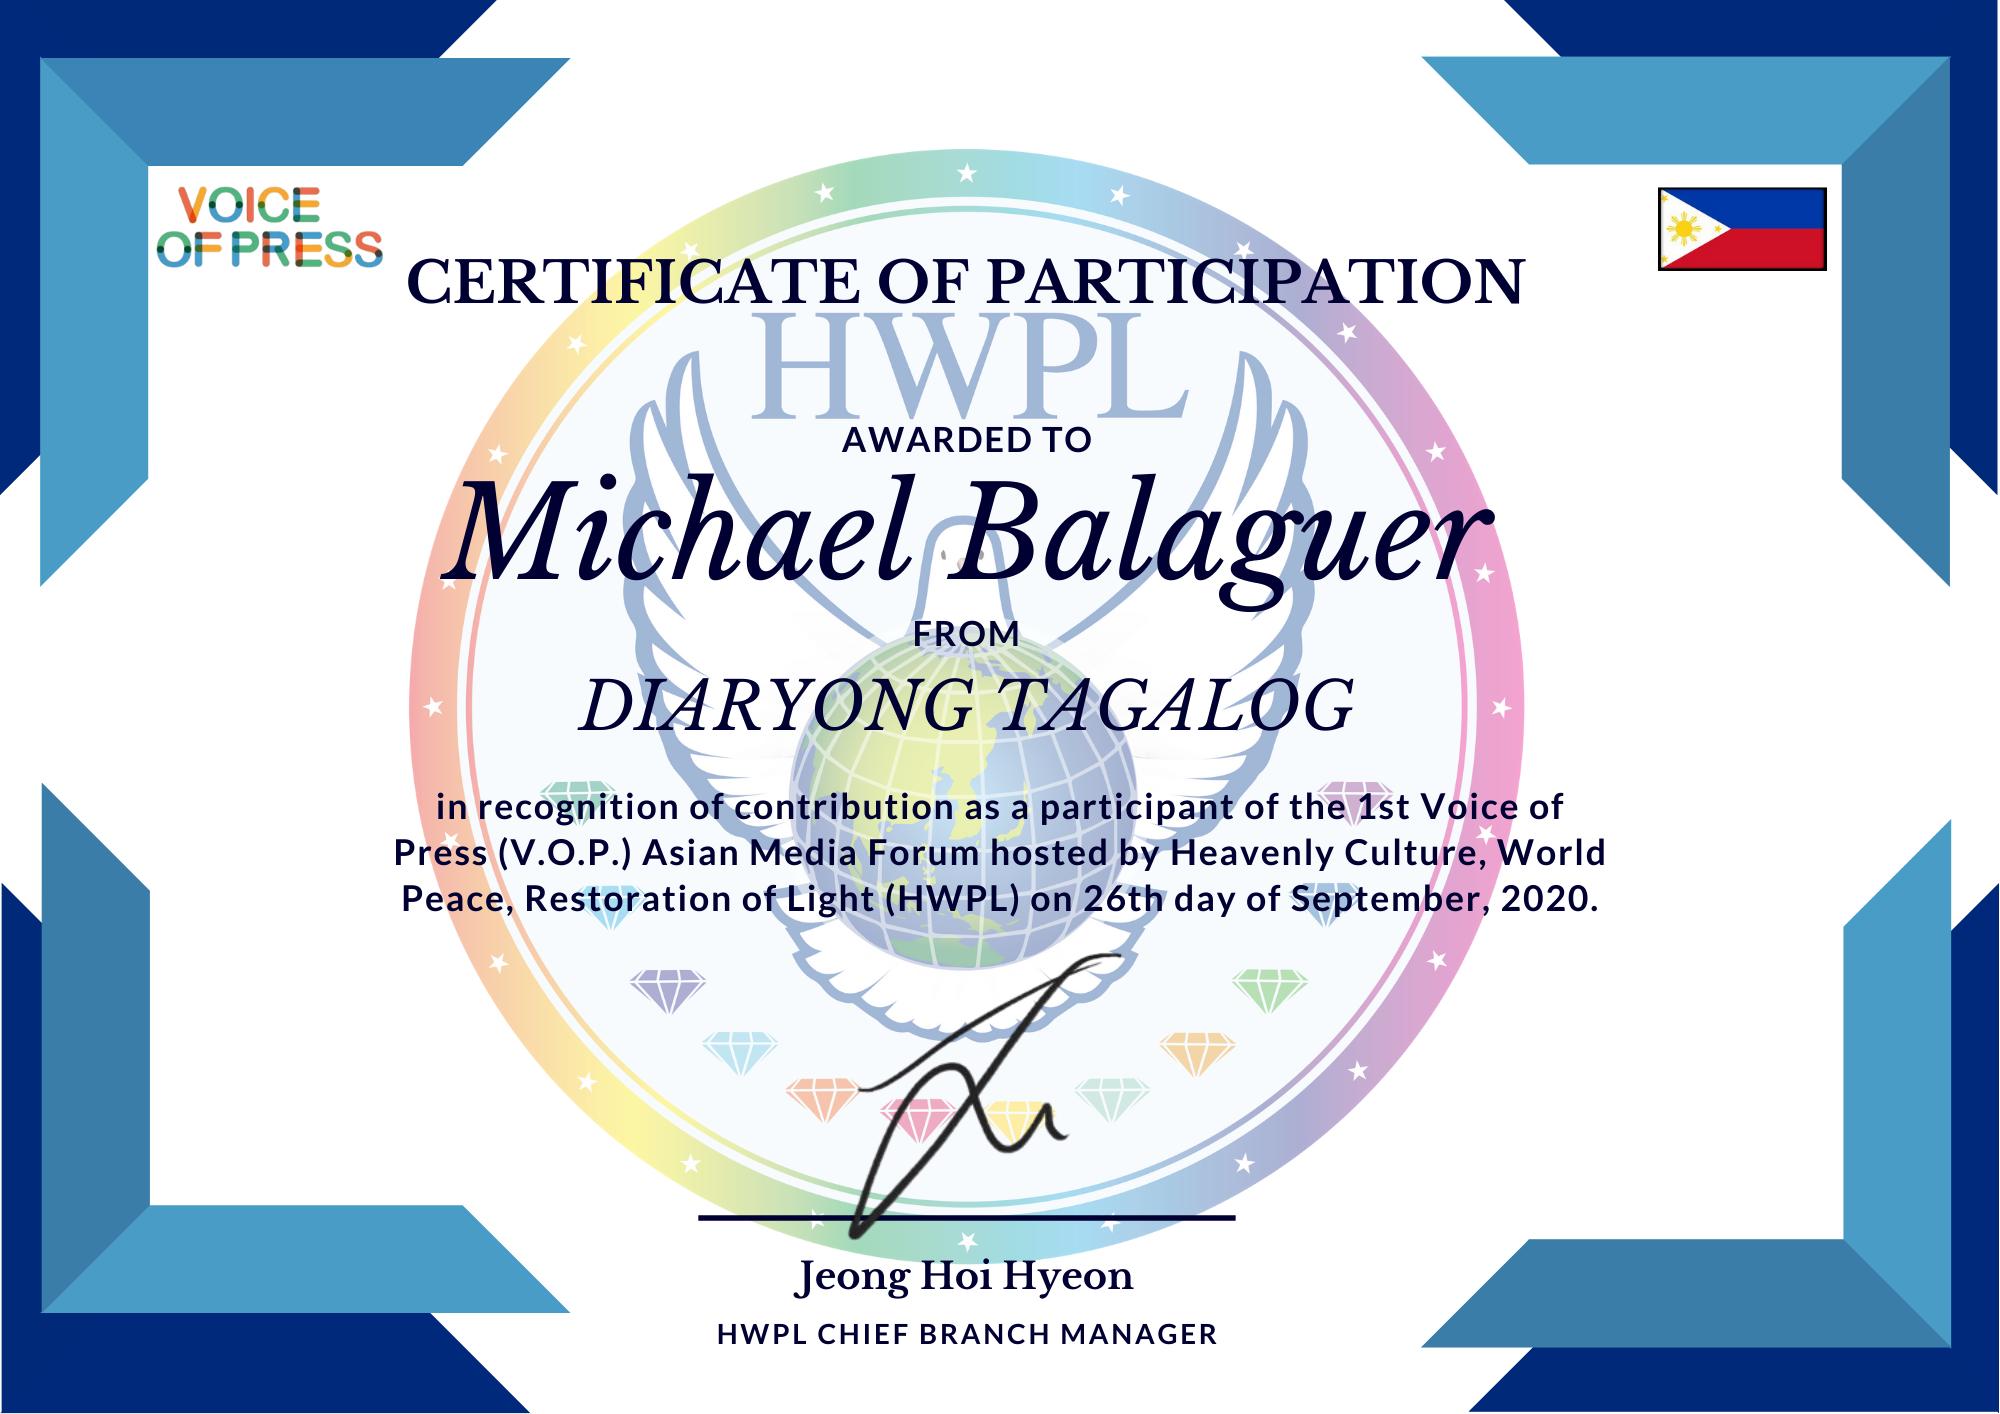 Michael Balaguer